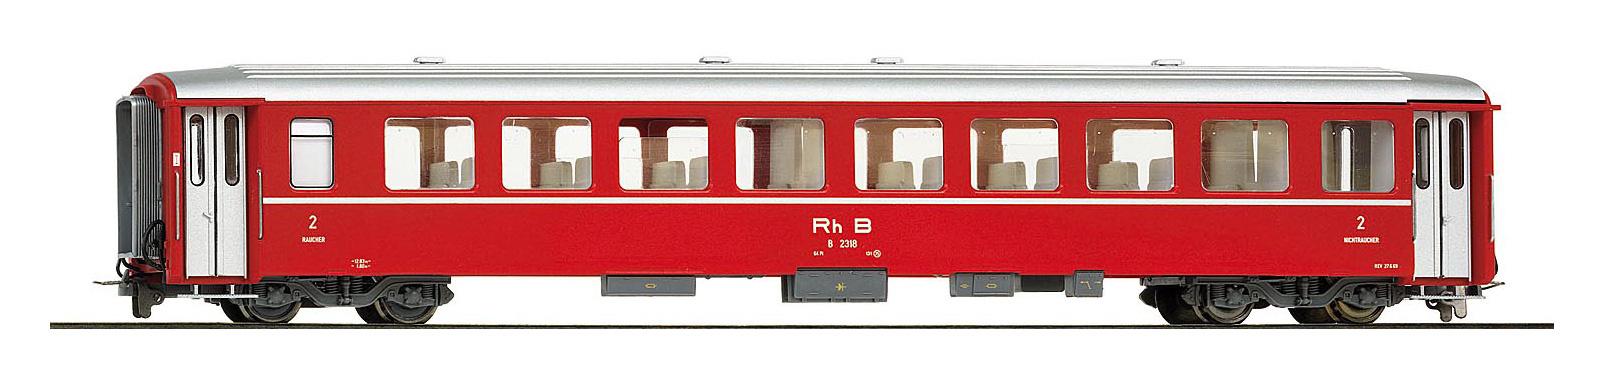 3253118 RhB B 2318 EW I Arosa, 70er Jahre-1